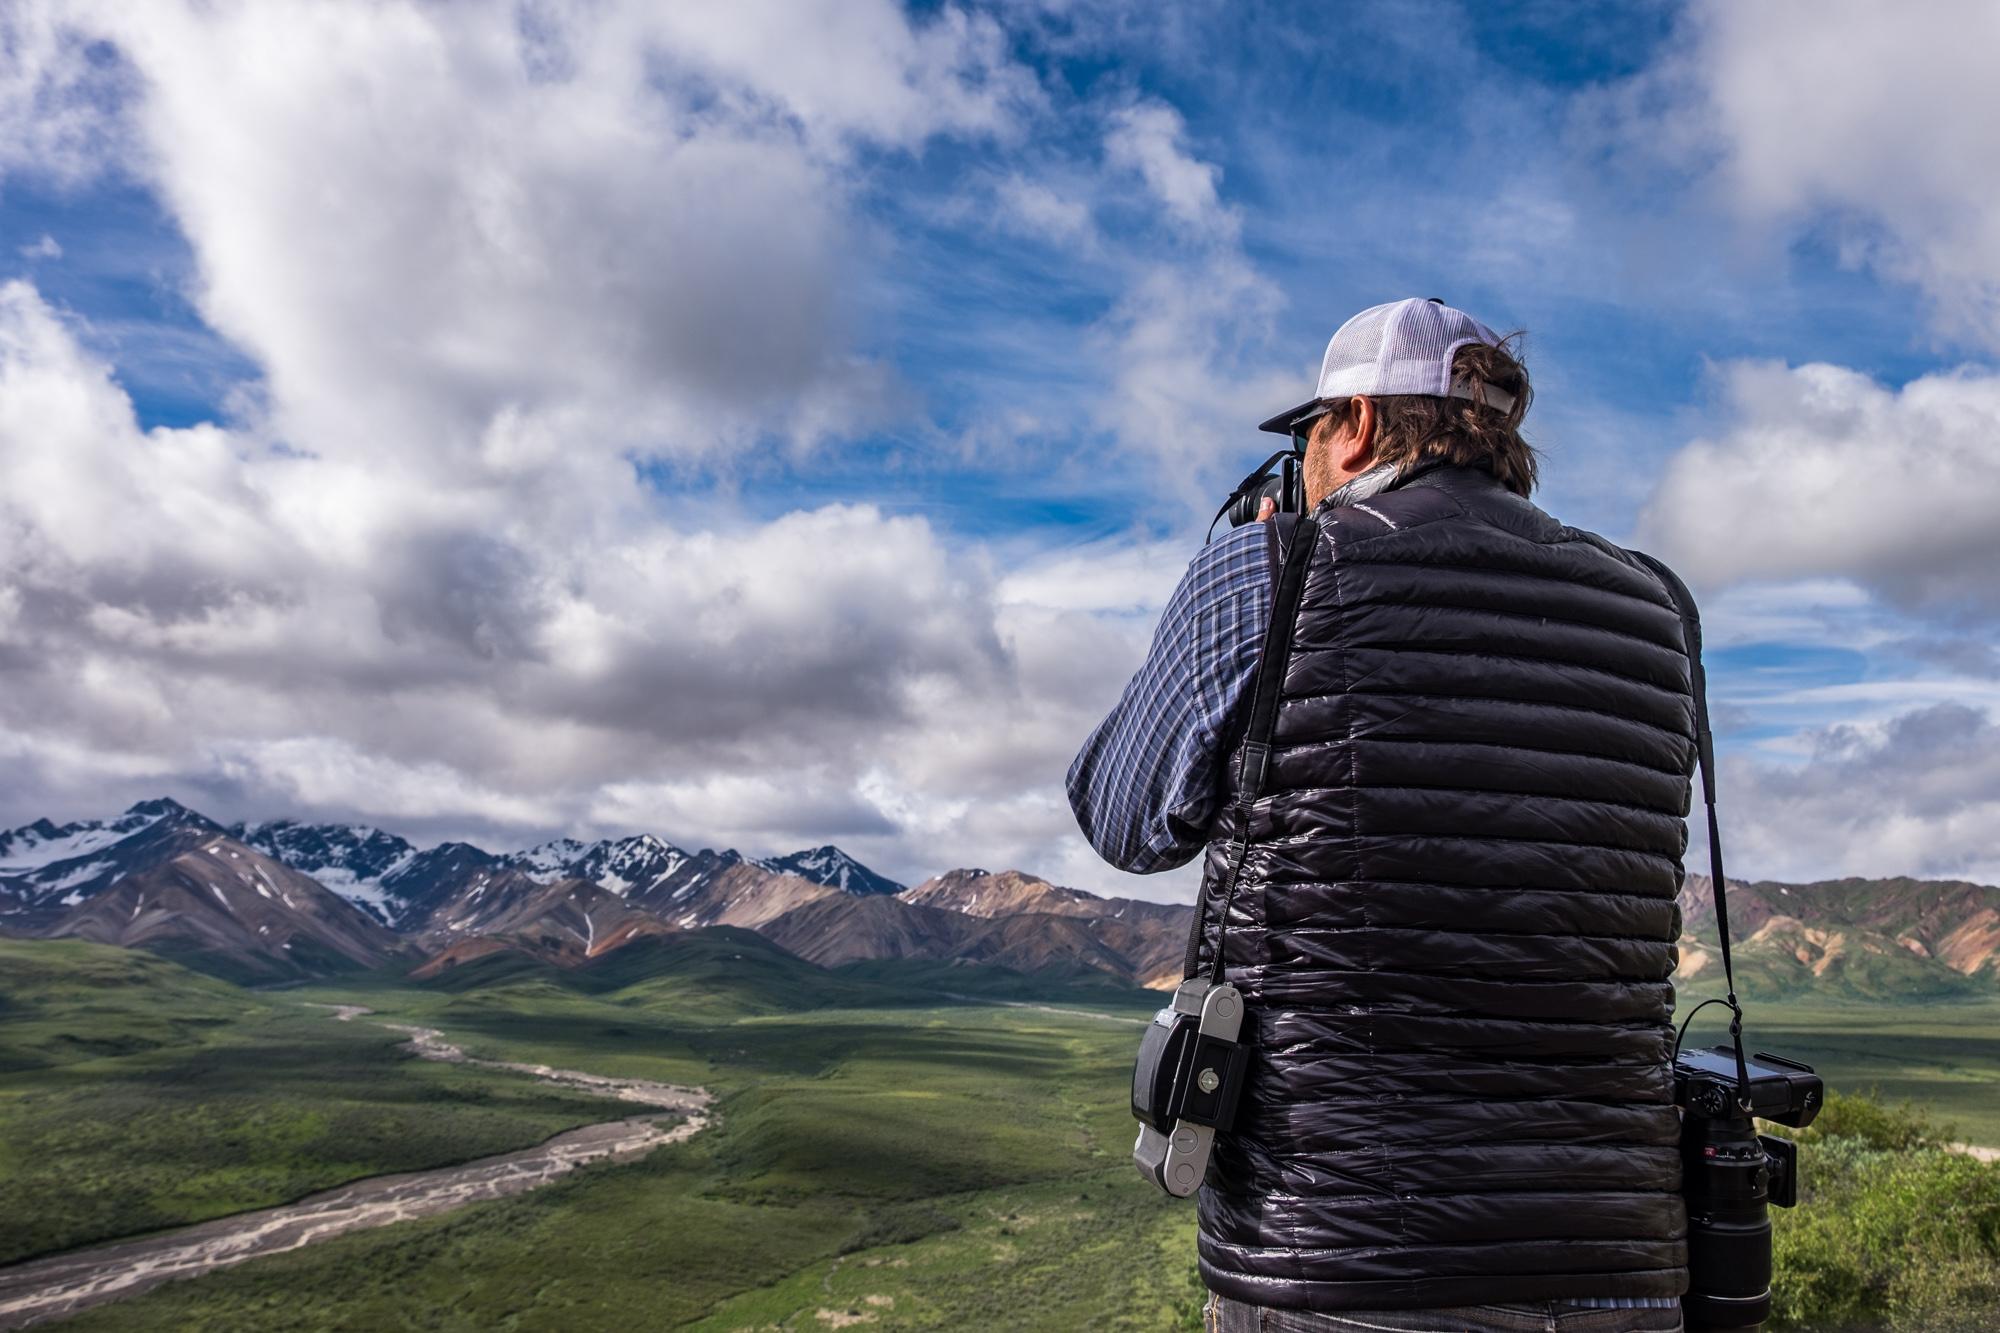 Jonathan Irish photographing the wild Alaska landscape at Denali National Park with the Fujifilm X-T1.